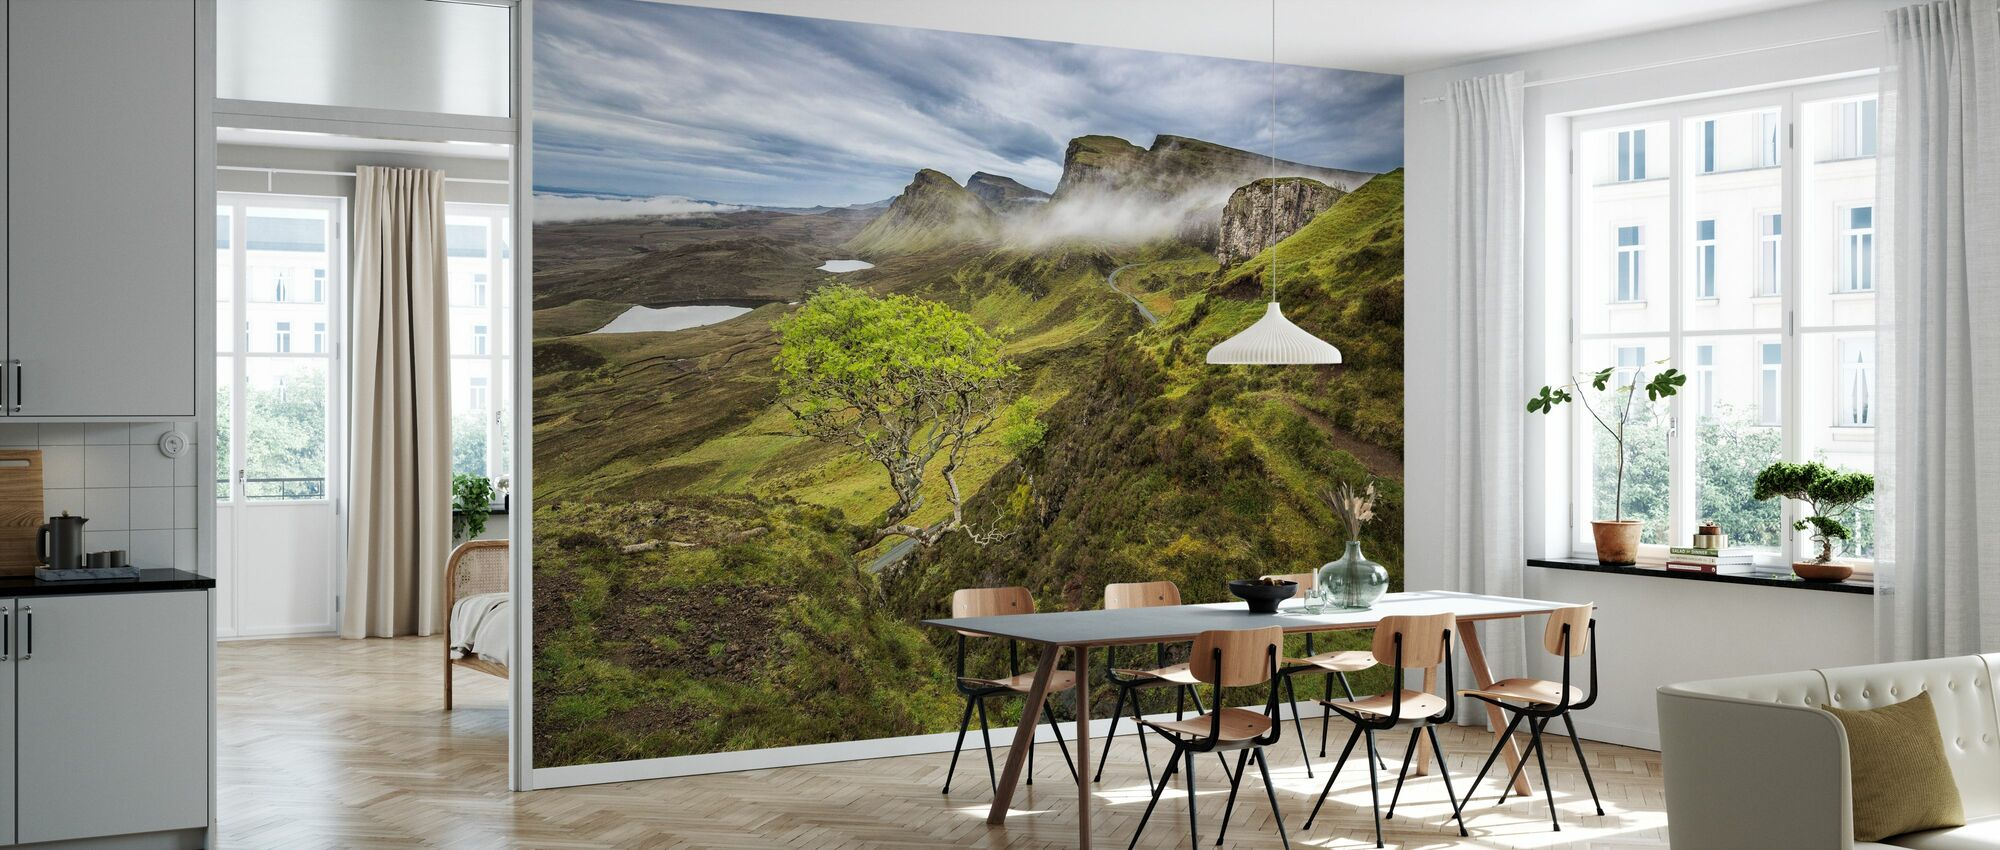 Quirang, Isle of Skye - Scotland - Wallpaper - Kitchen